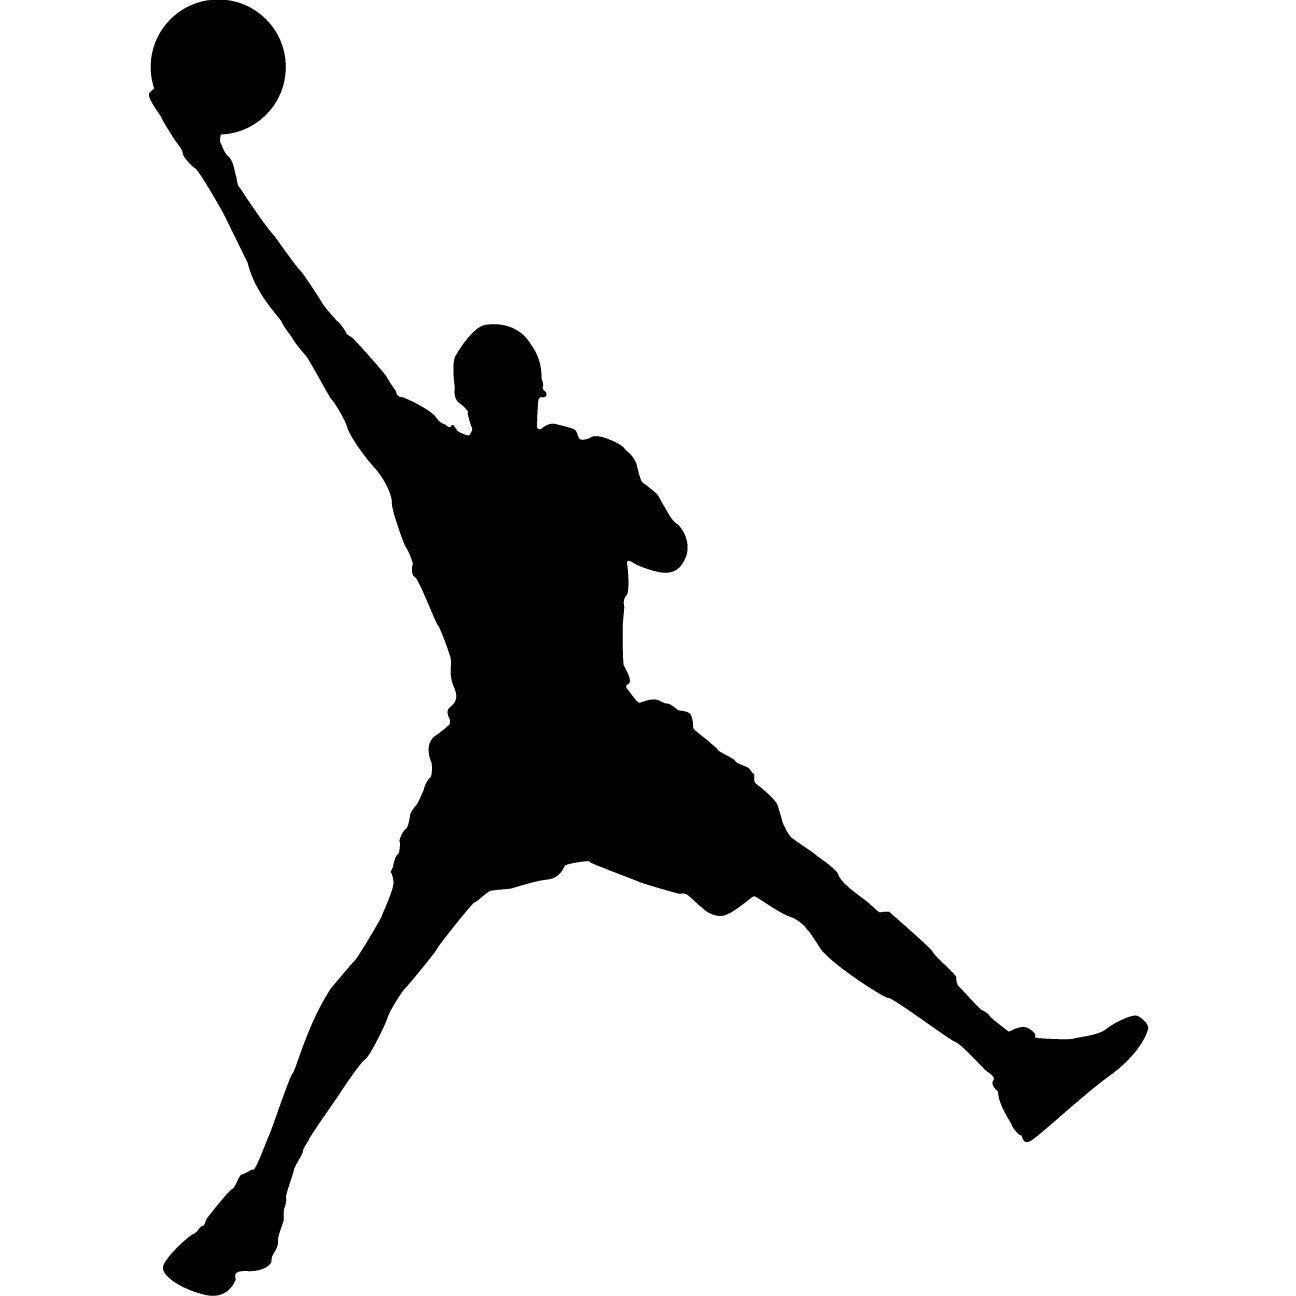 1296x1296 Basketball Silhouette Clip Art Jordan